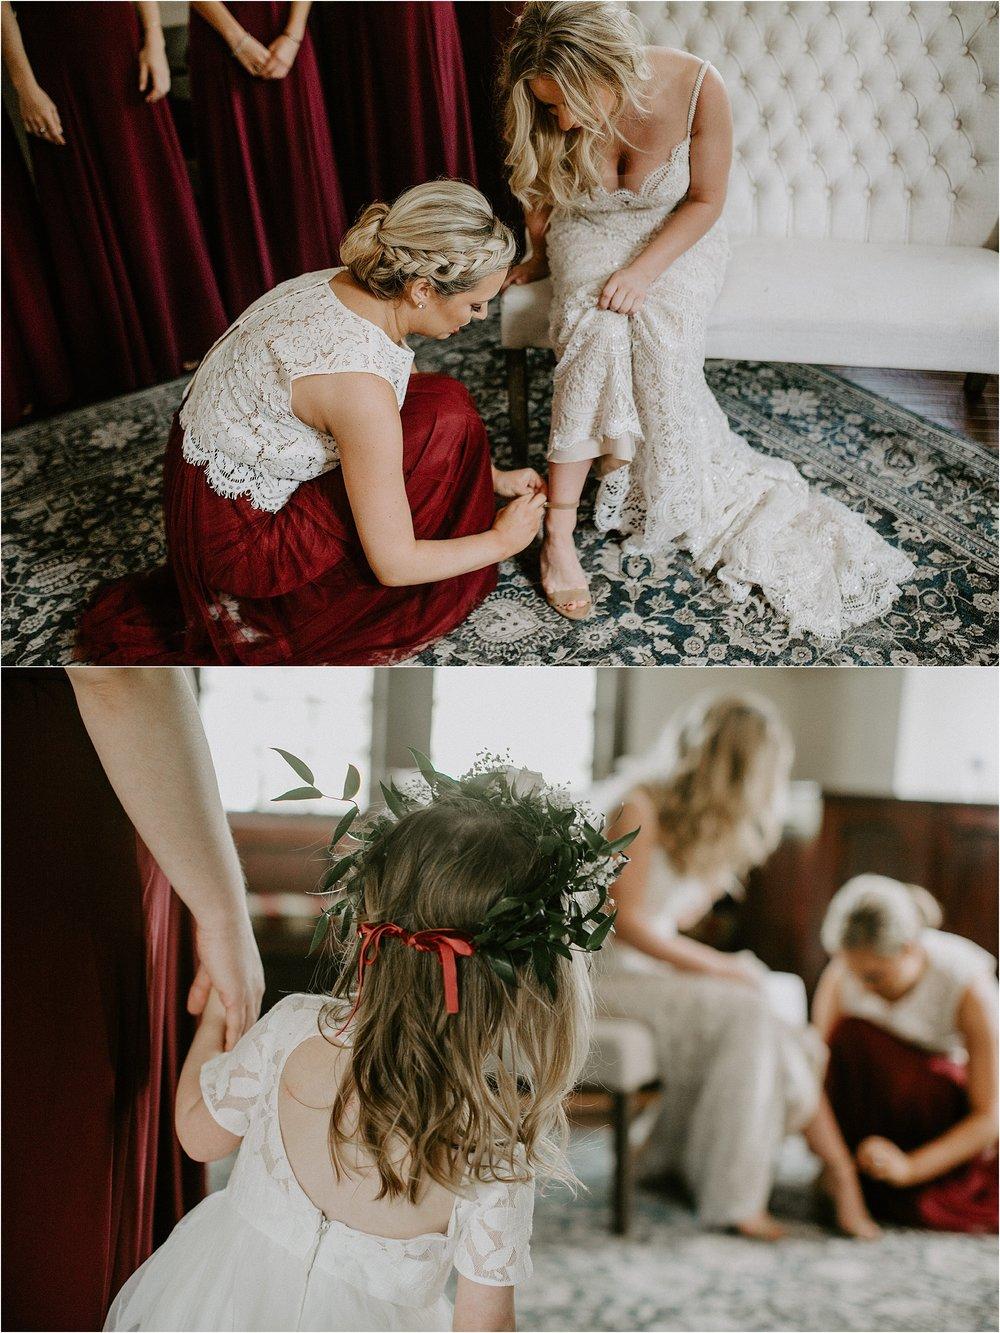 Sarah_Brookhart_Philadelphia_Wedding_Photographer_0009.jpg